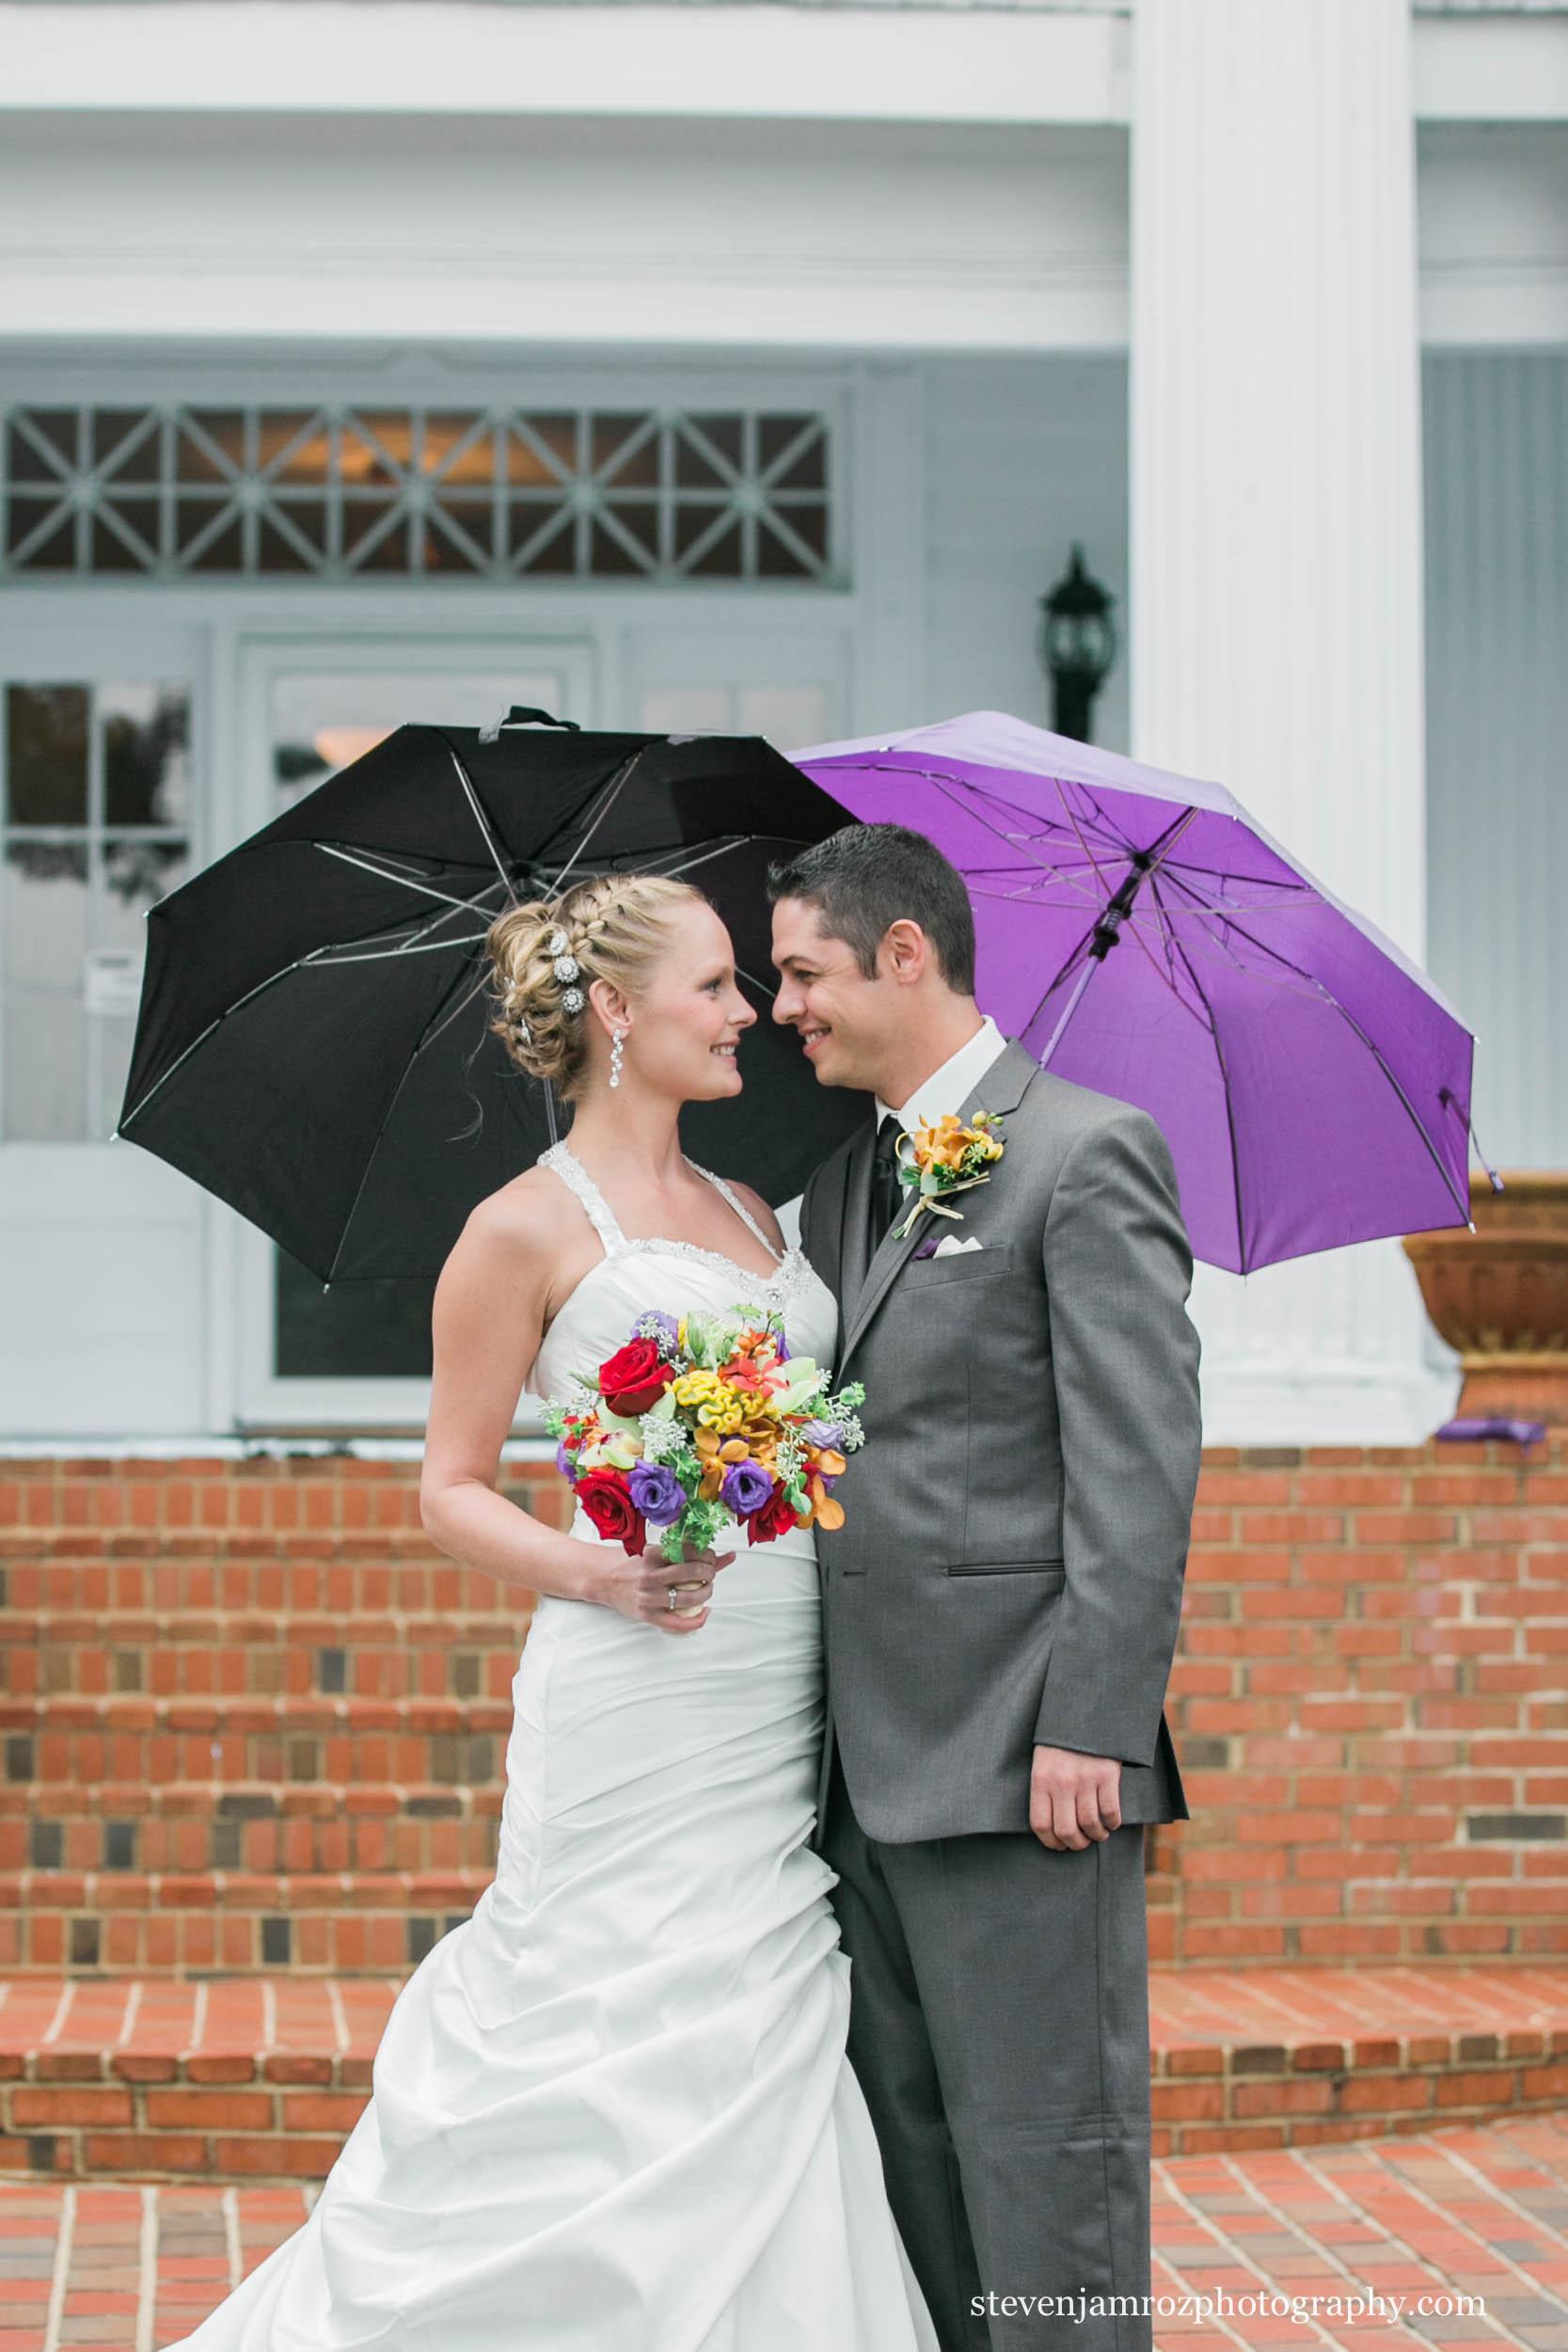 rain-wedding-hudson-manor-estate-umbrellas-wedding-steven-jamroz-photography-0450.jpg